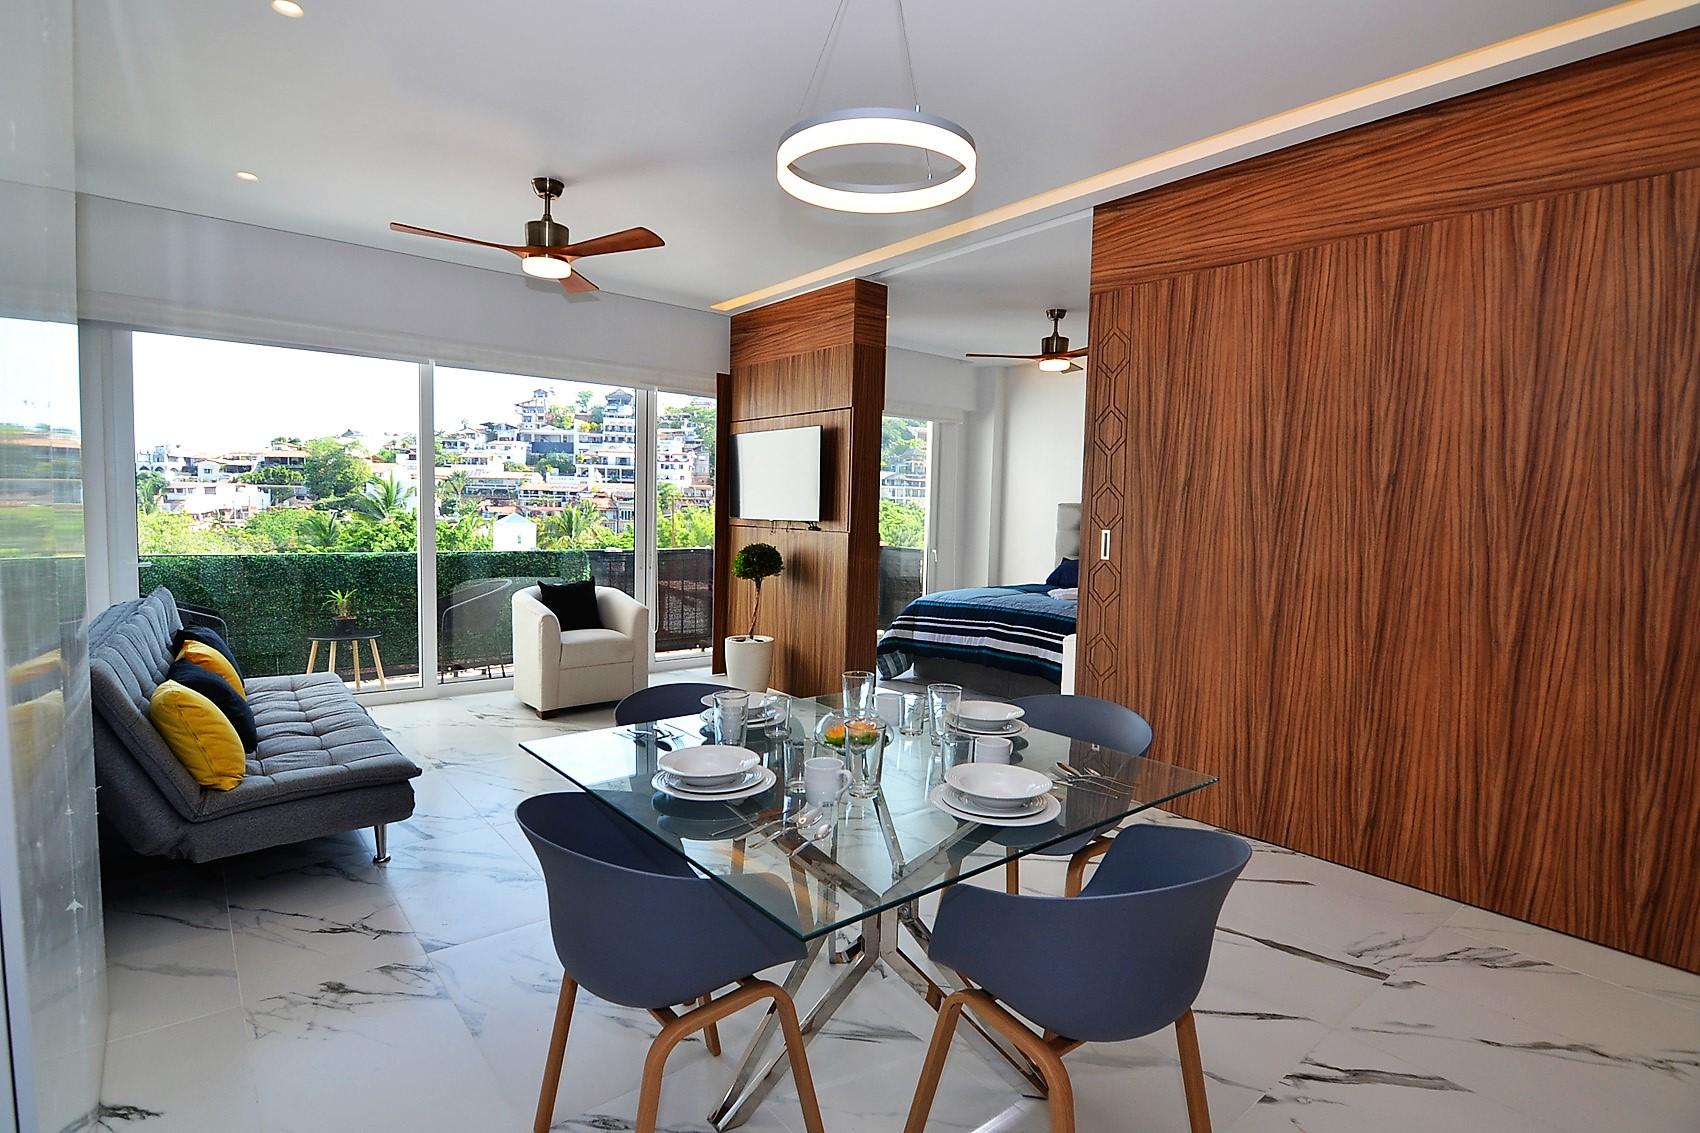 Condo Avida Super Studio 4 - Puerto Vallarta Furnished Condo Romantic Zone (1)